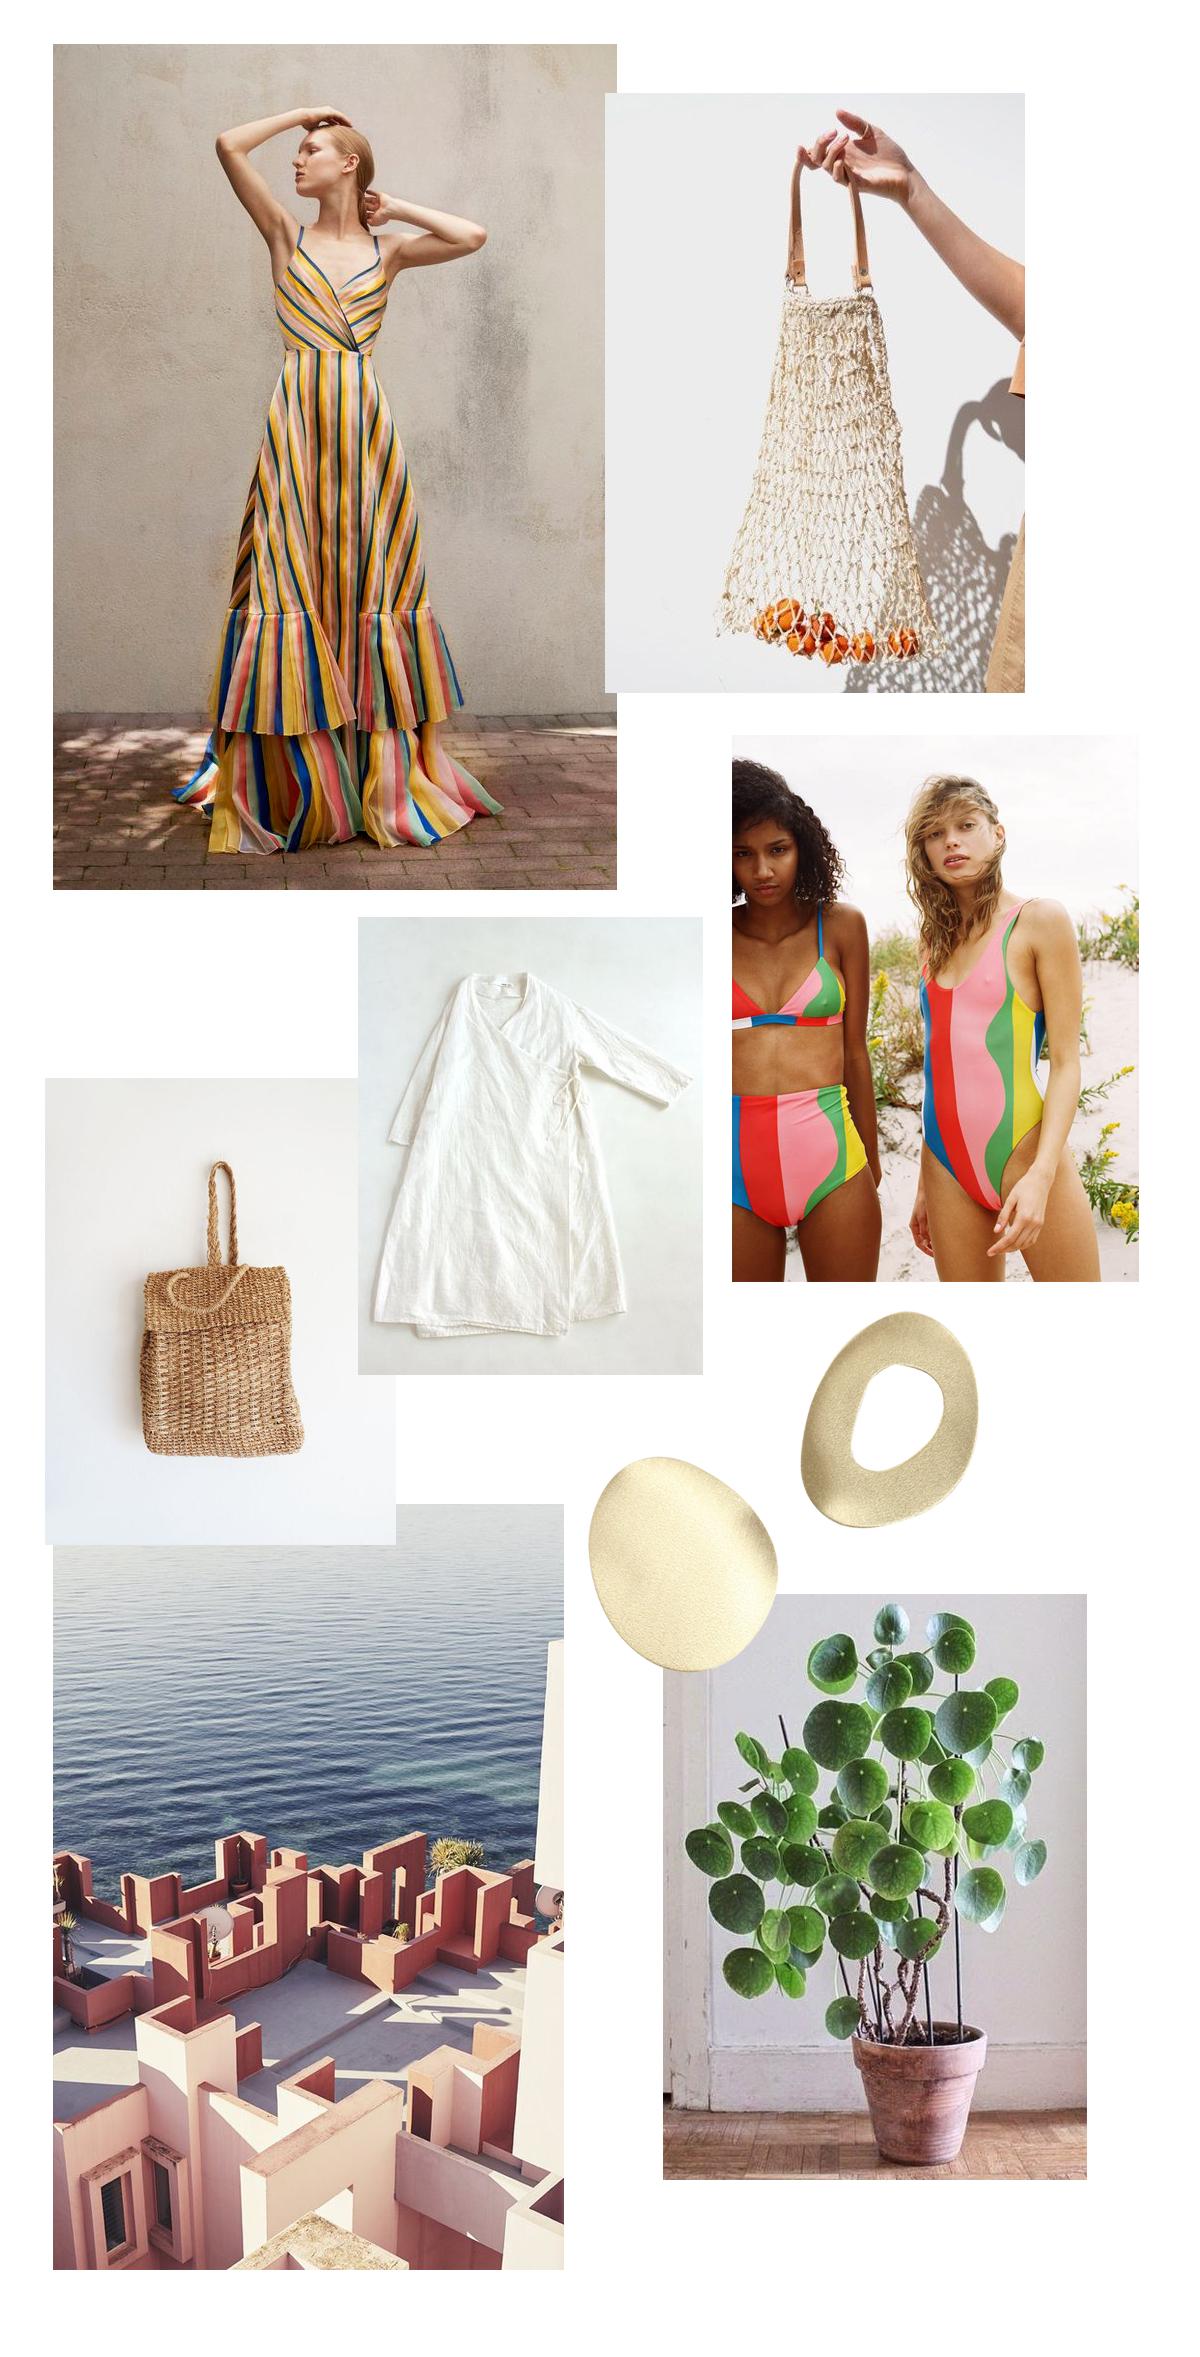 1 -   Carolina Herrera  , 2 -   Dainty Fashion  , 3 -   Barnaby Jack  , 4 -   Evam Eva  , 5 -   Mara Hoffman ,  6 -   Vogue  , 7 -   Nila ,  8 -   Littlegrennshed